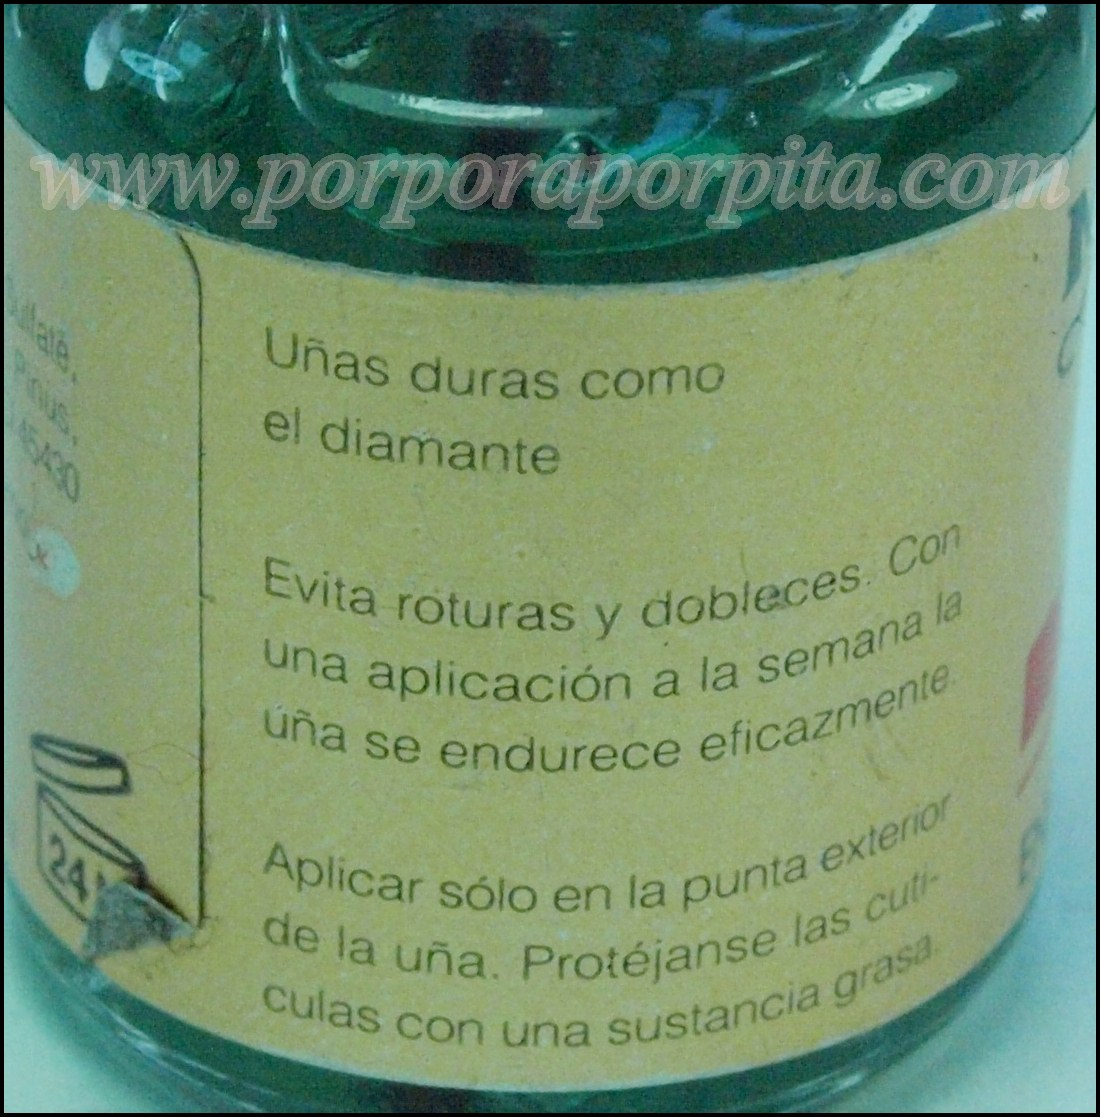 Review Científico de MAVALA (endurecedor de uñas) - Pórpora Porpita